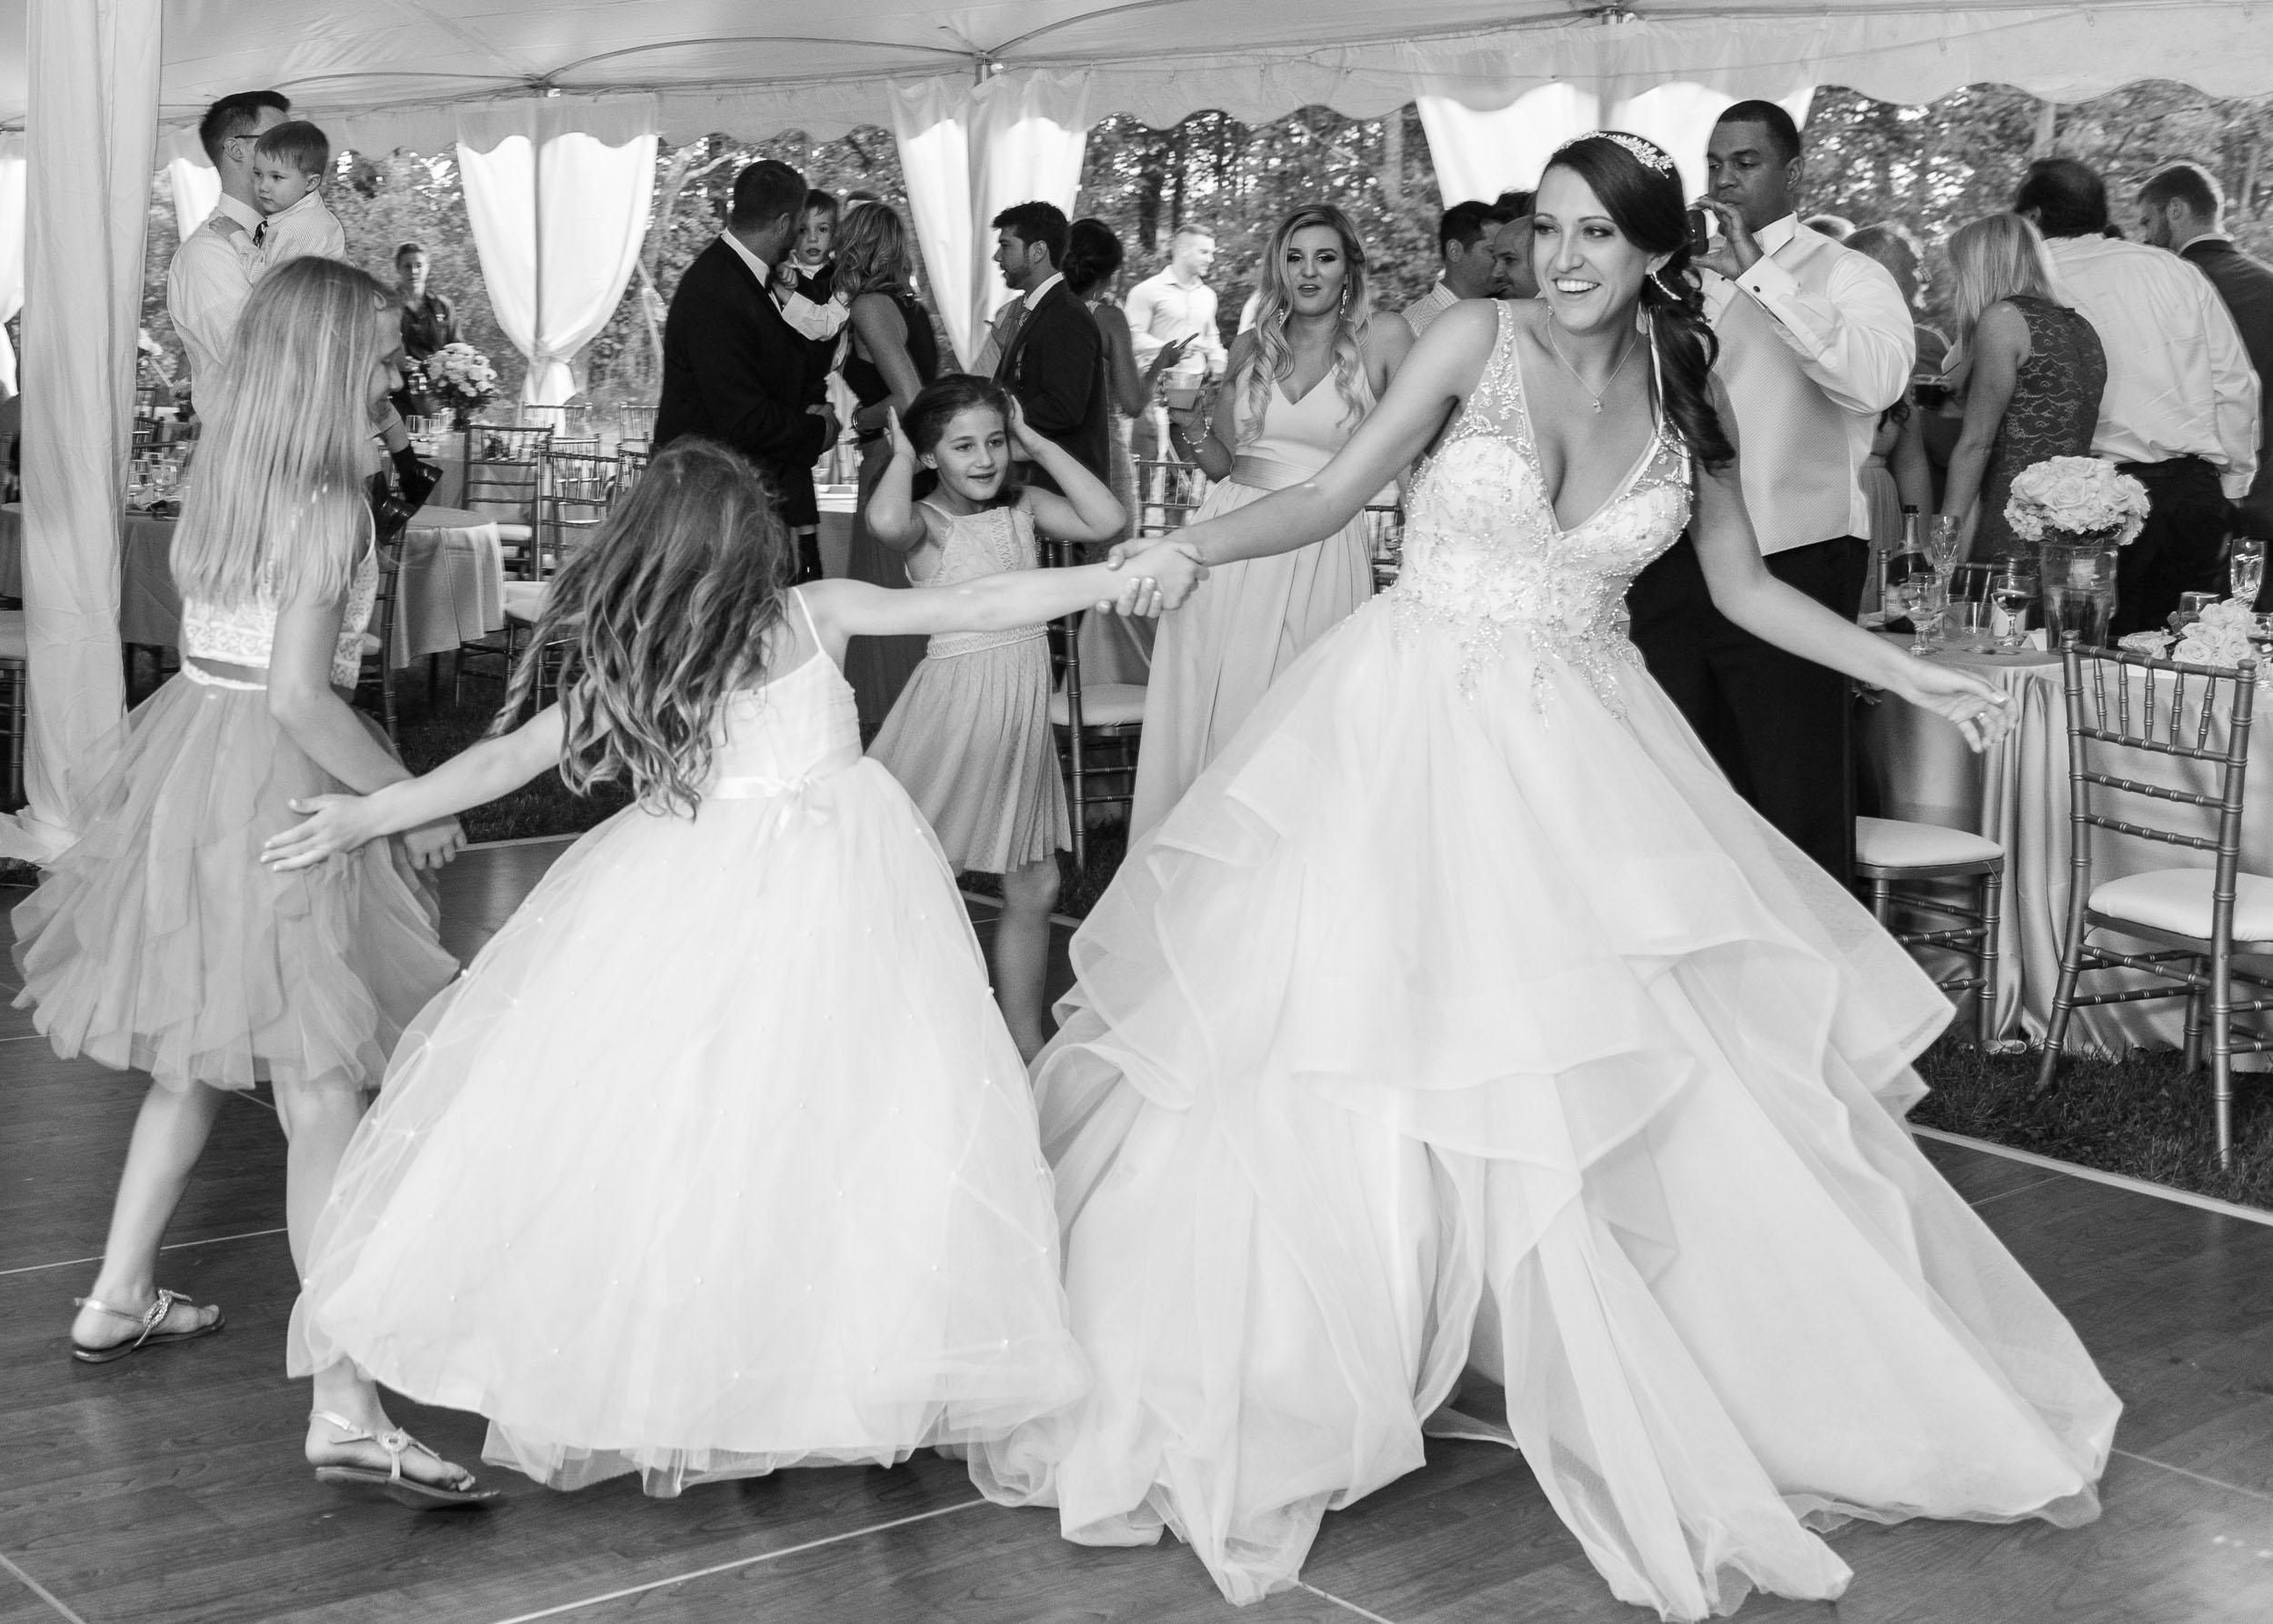 Wedding-reception-dancing-8.jpg